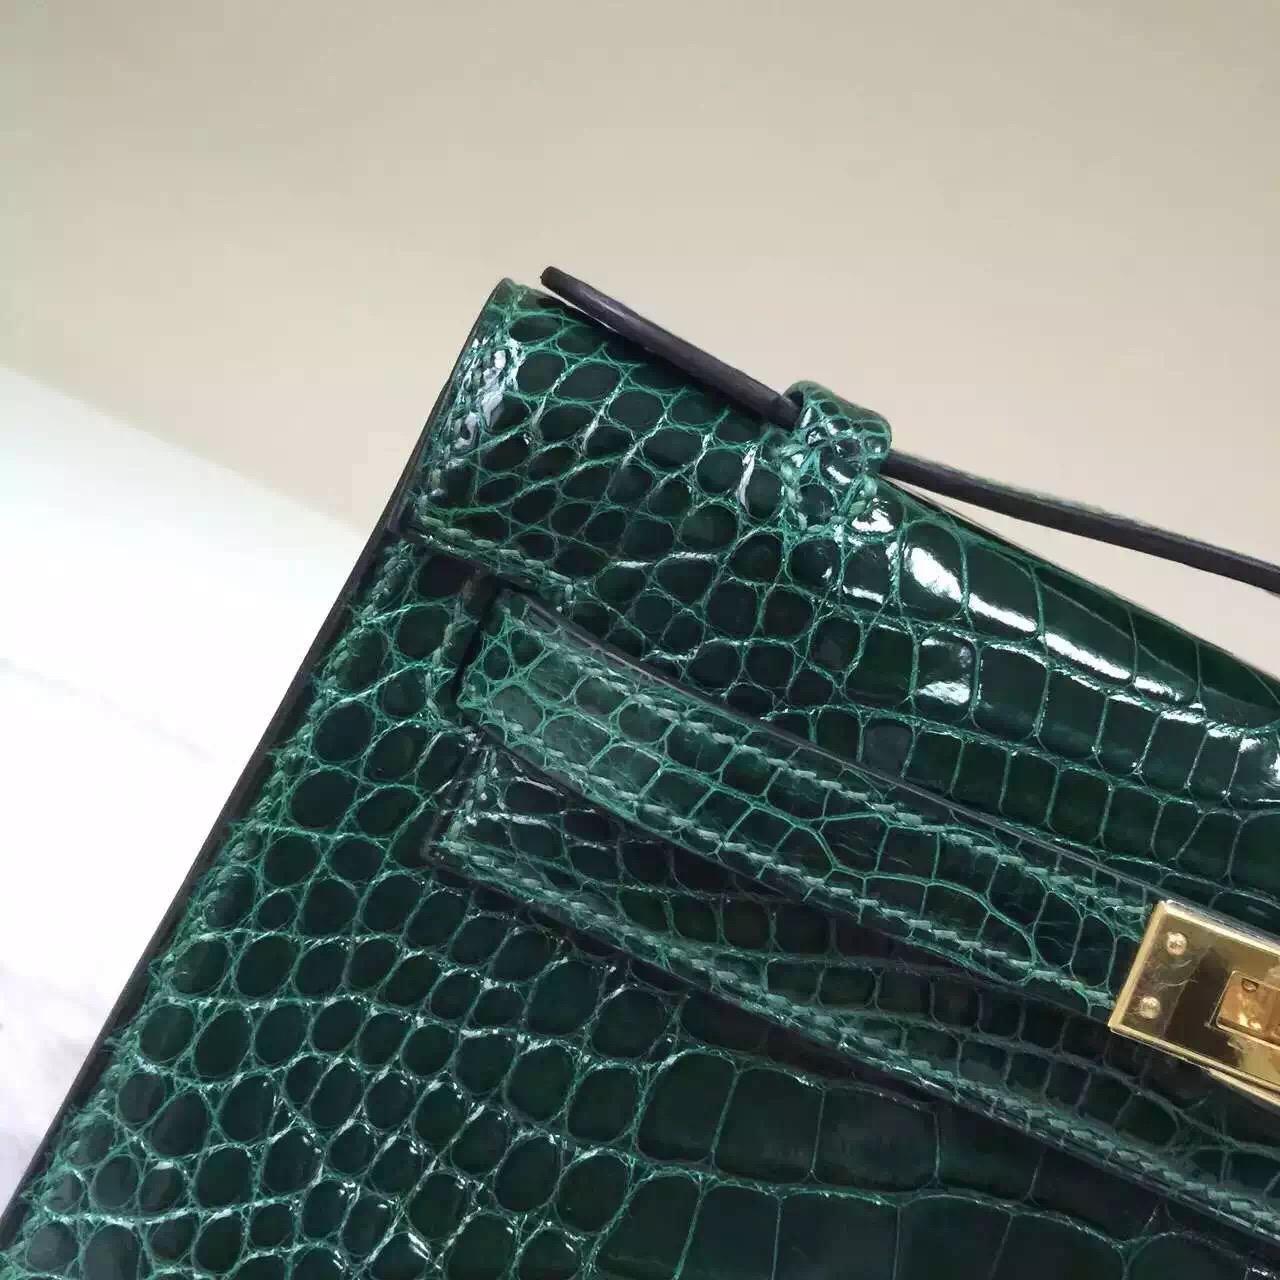 Hermes MiniKelly Pochette 22cm in CK67 Vert fonce Crocodile Leather